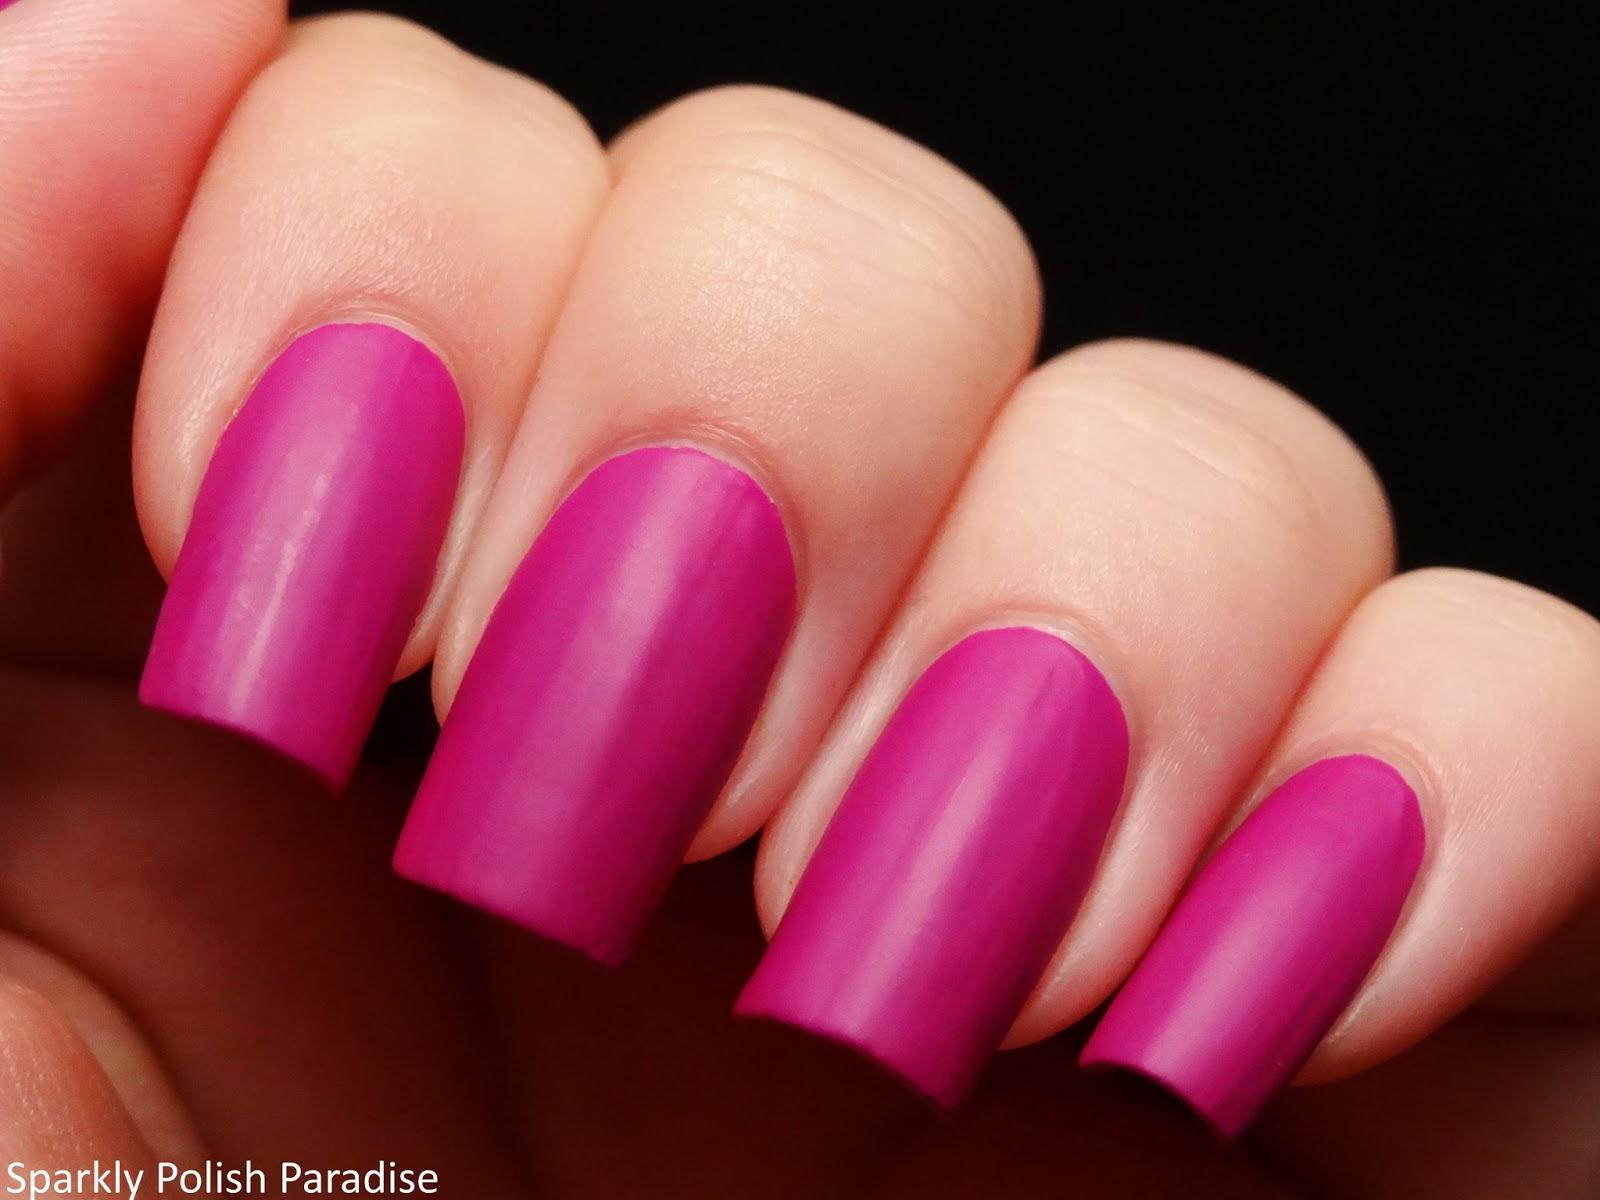 http://sparklypolishparadise.blogspot.de/2014/11/lacke-in-farbe-und-bunt-magenta.html